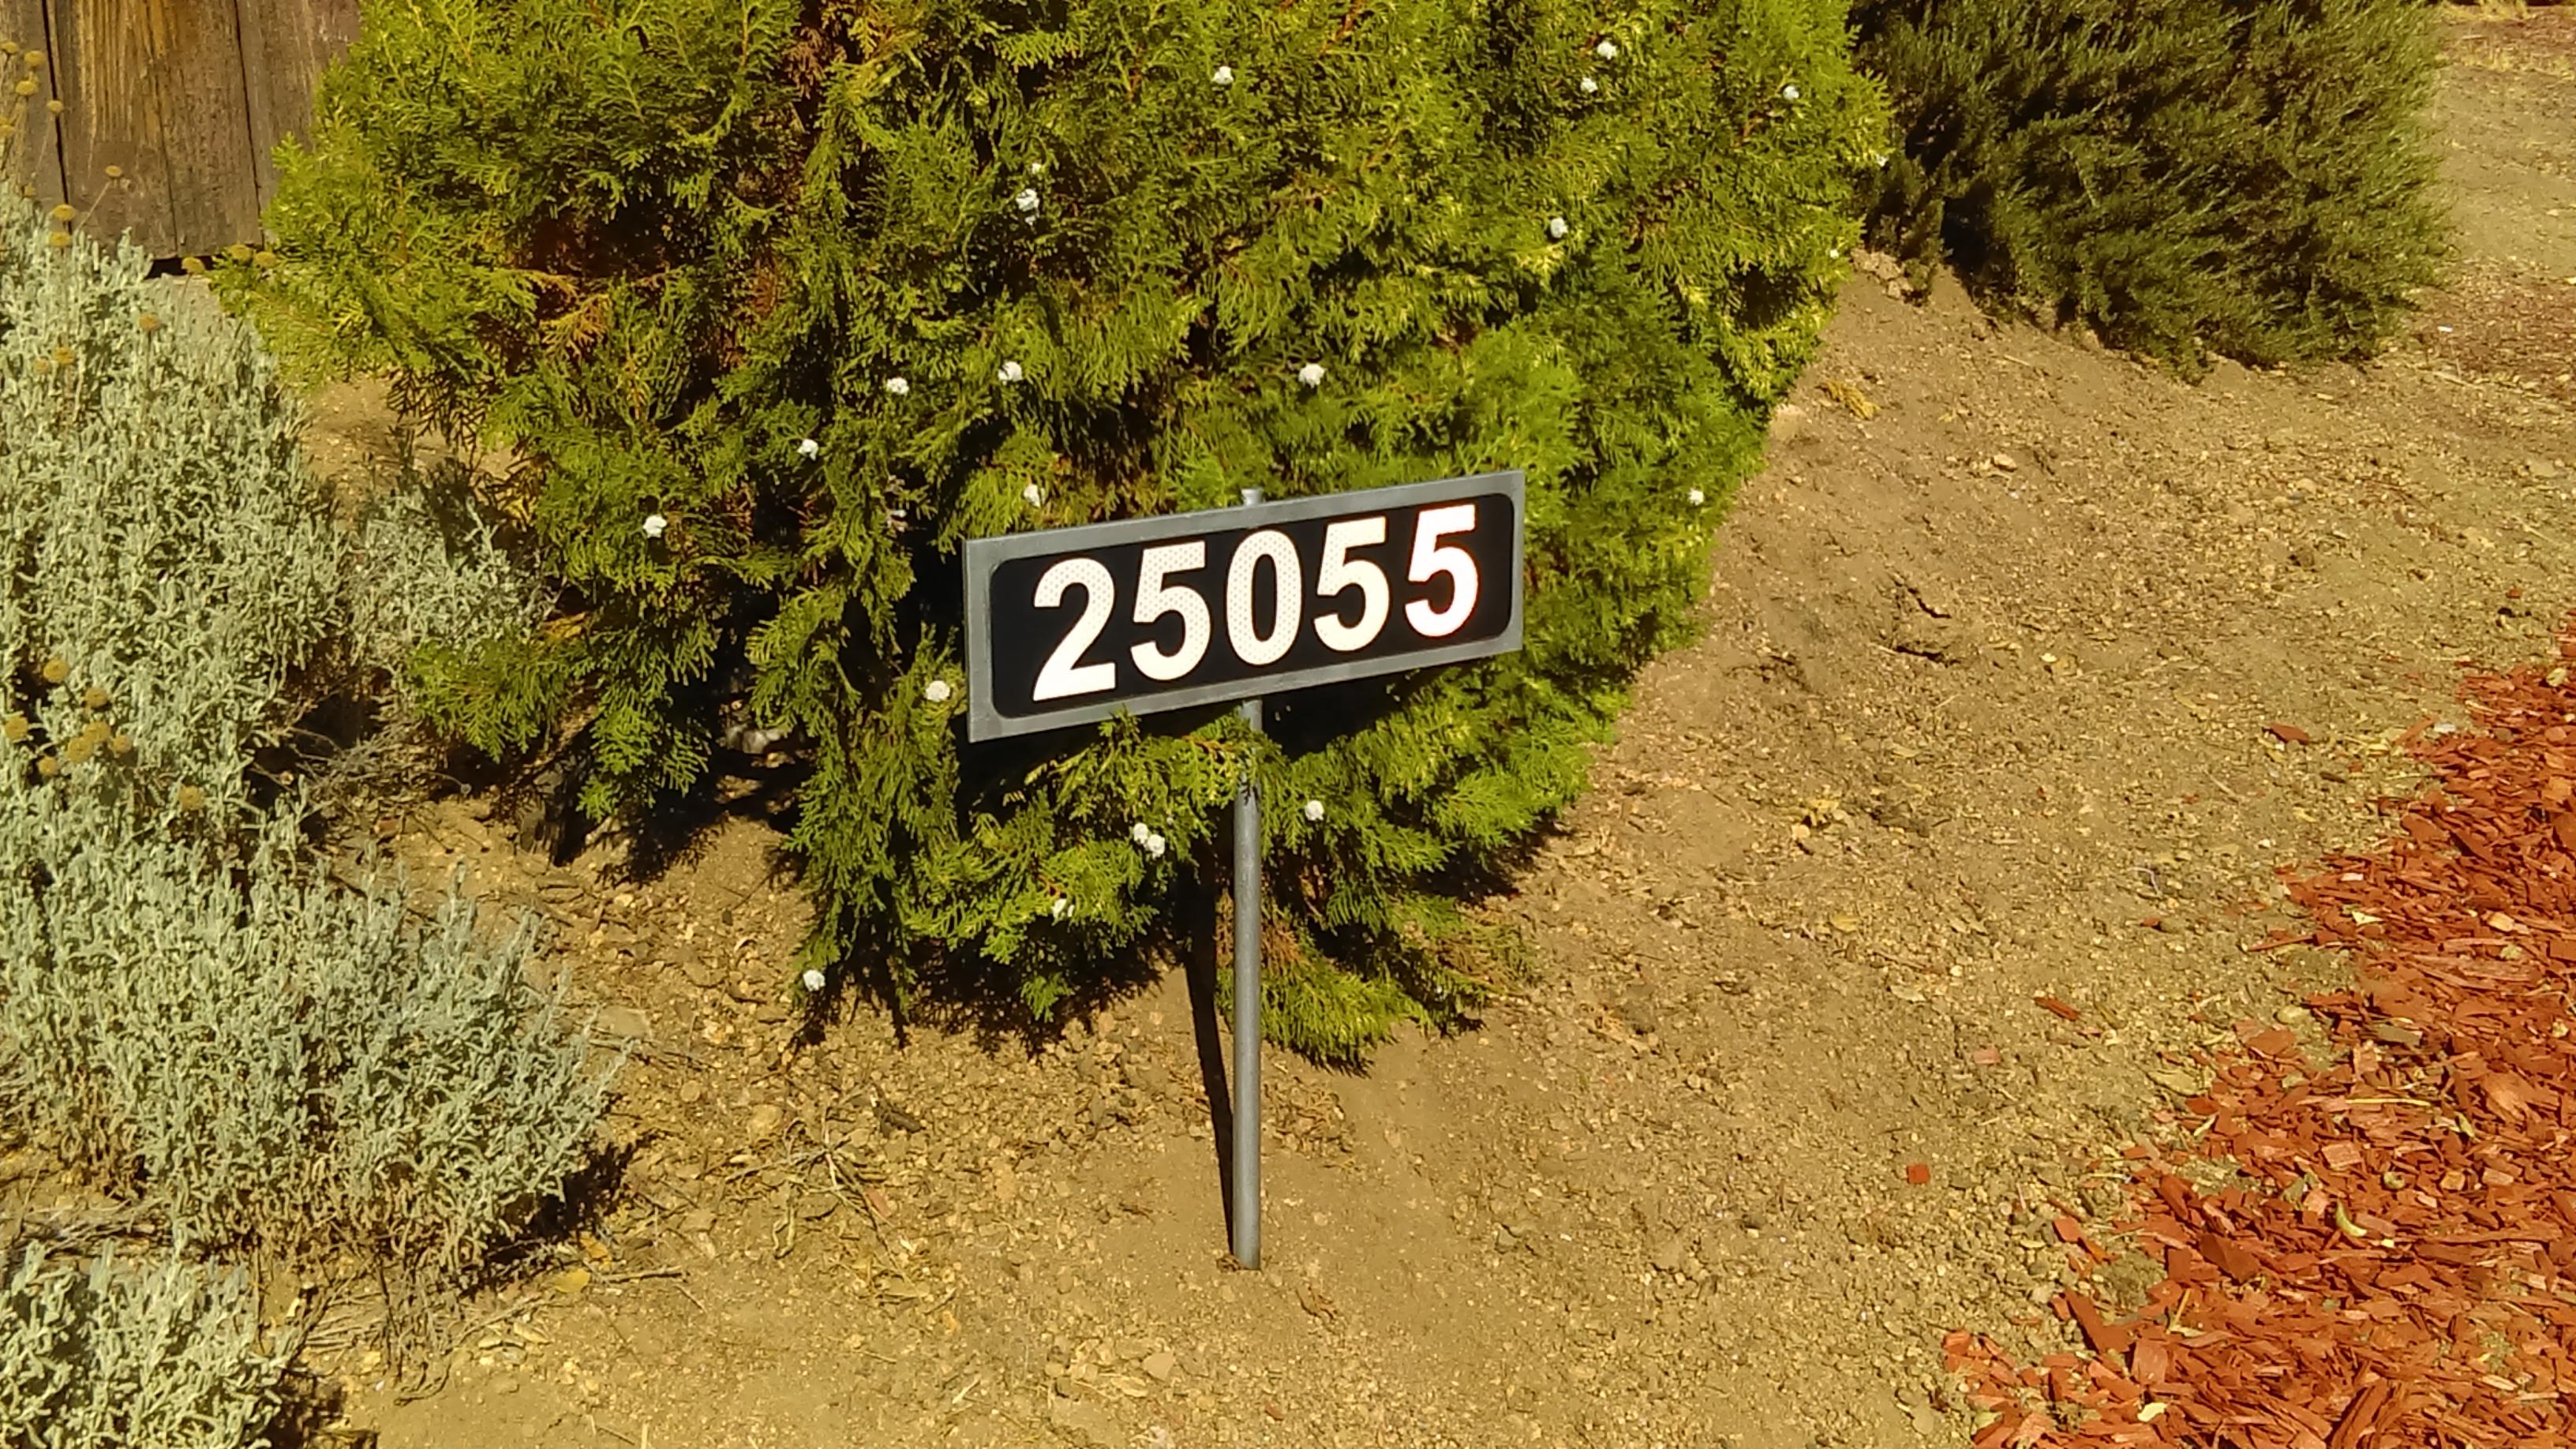 IMAG0178 - Reflective Address Sign